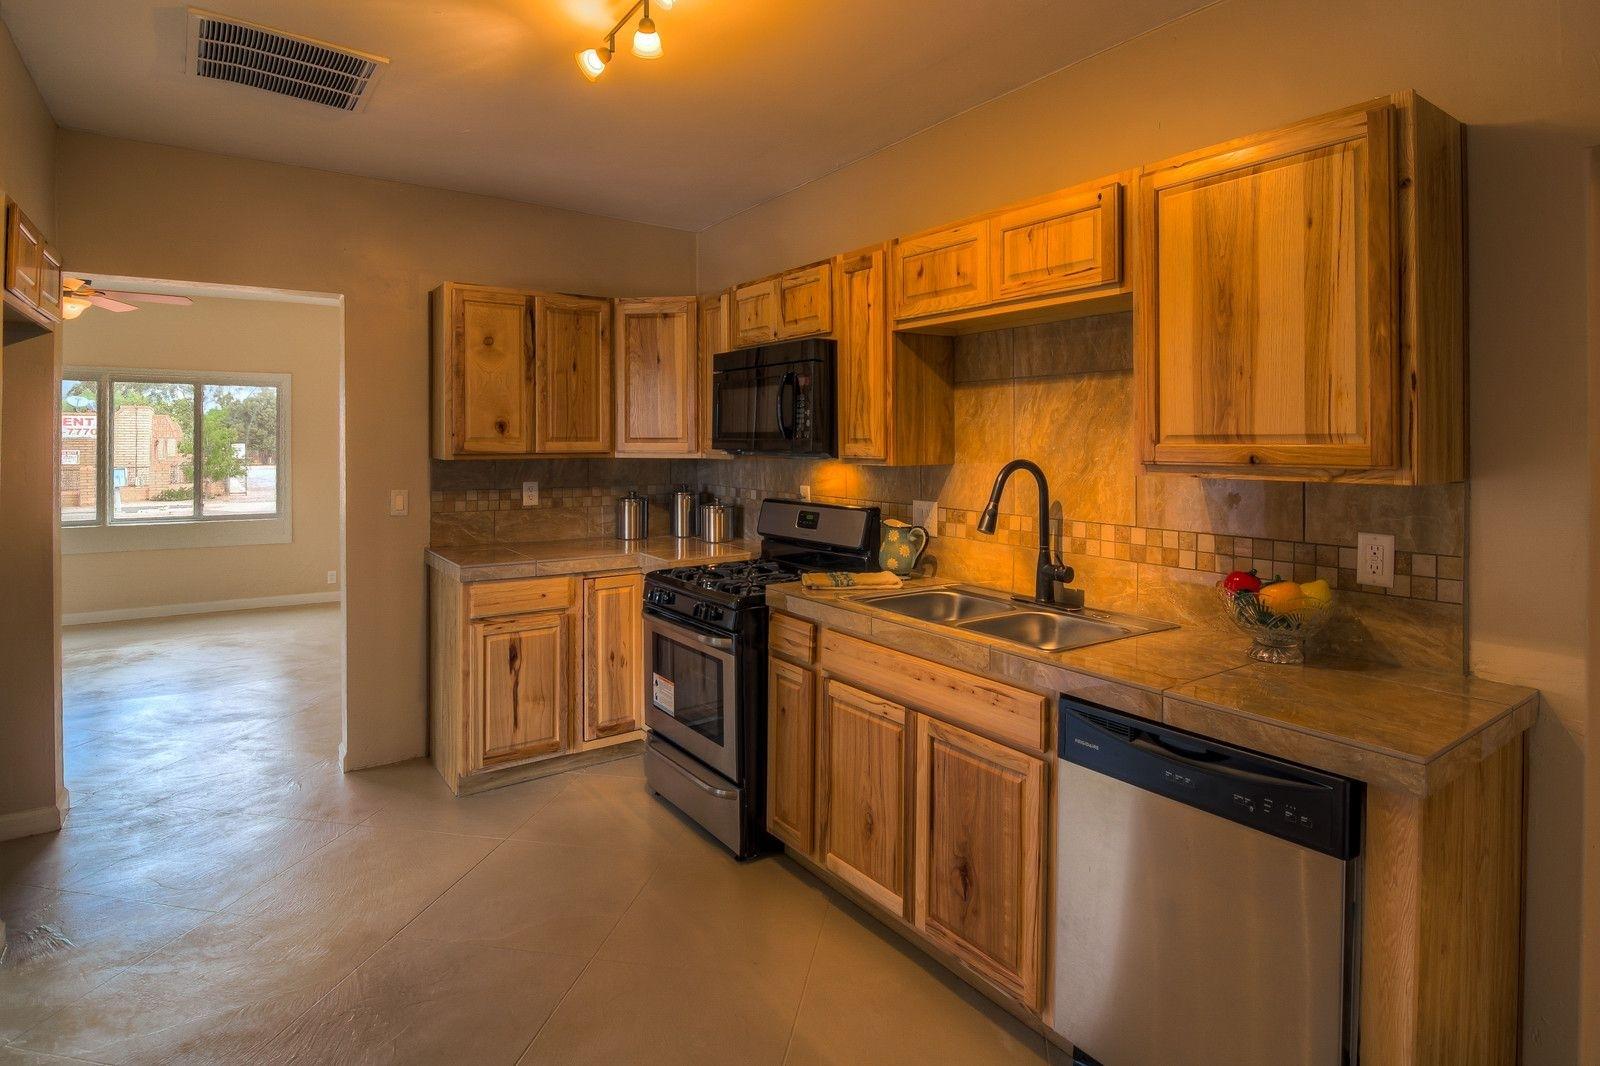 Kitchen Cabinets For Sale Tucson Az Kitchen And Bath